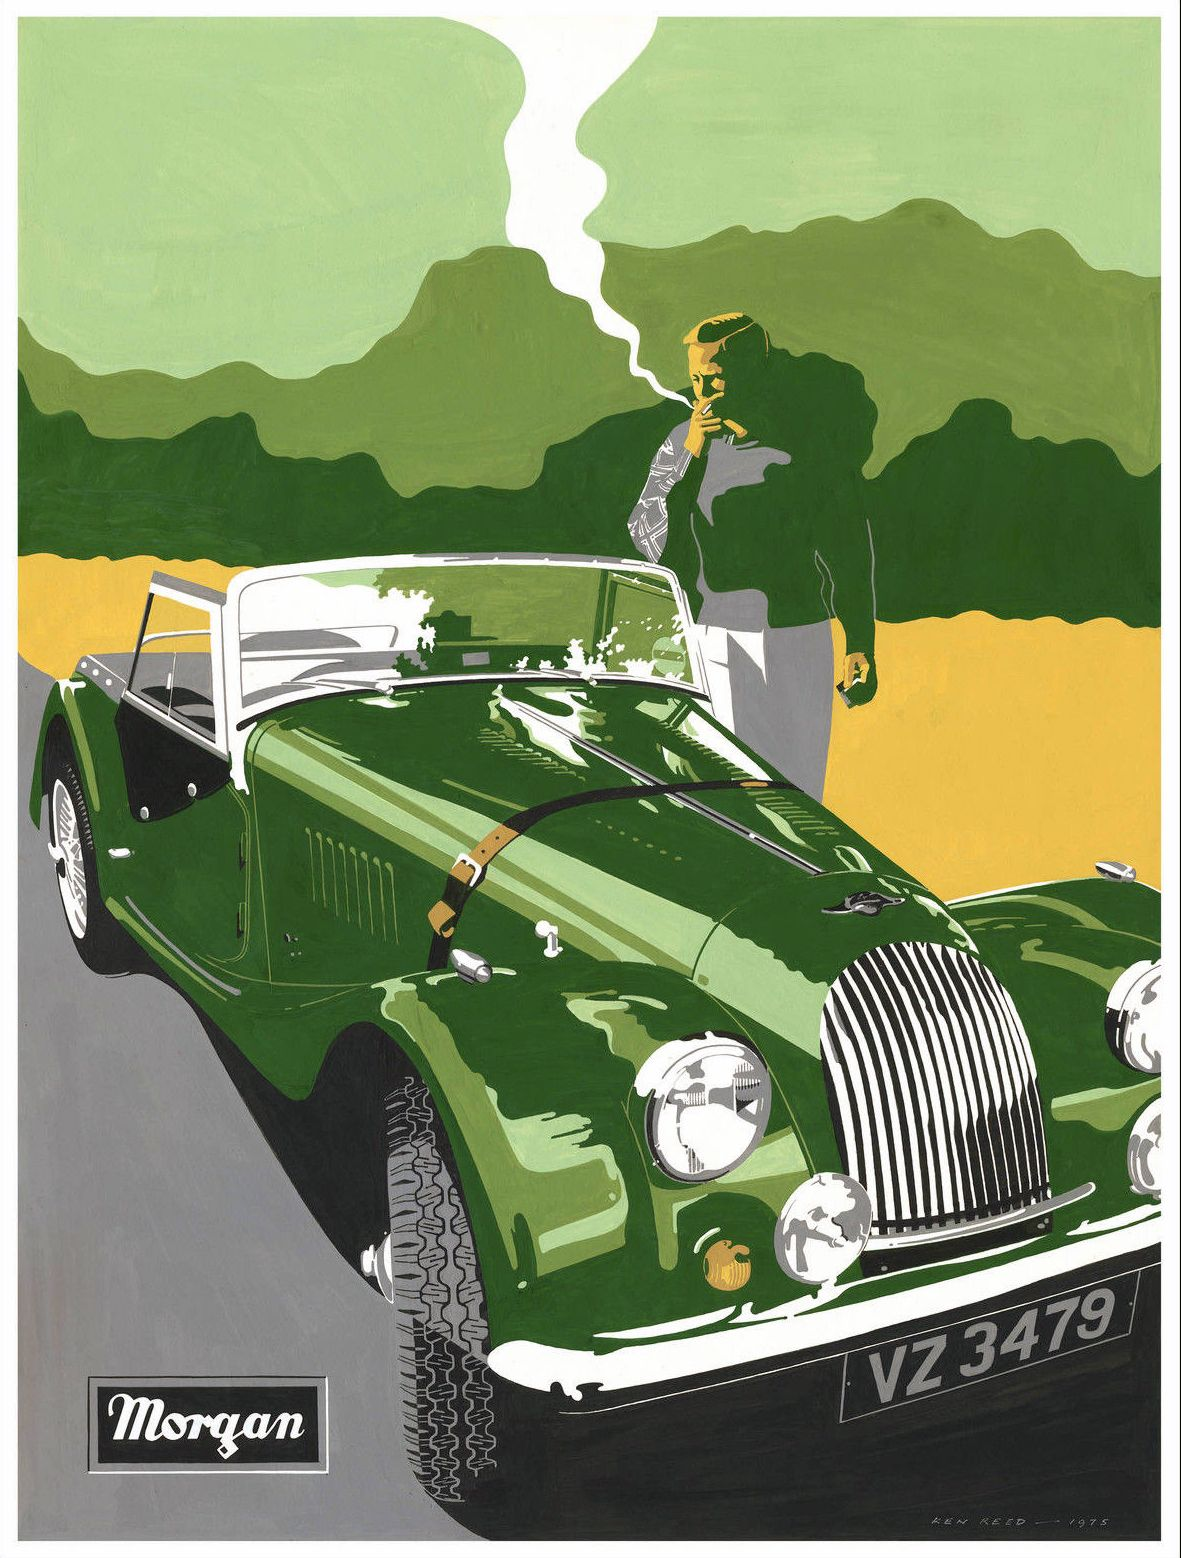 Morgan Sports Car Poster S Car Advertising Pinterest - Sports cars posters